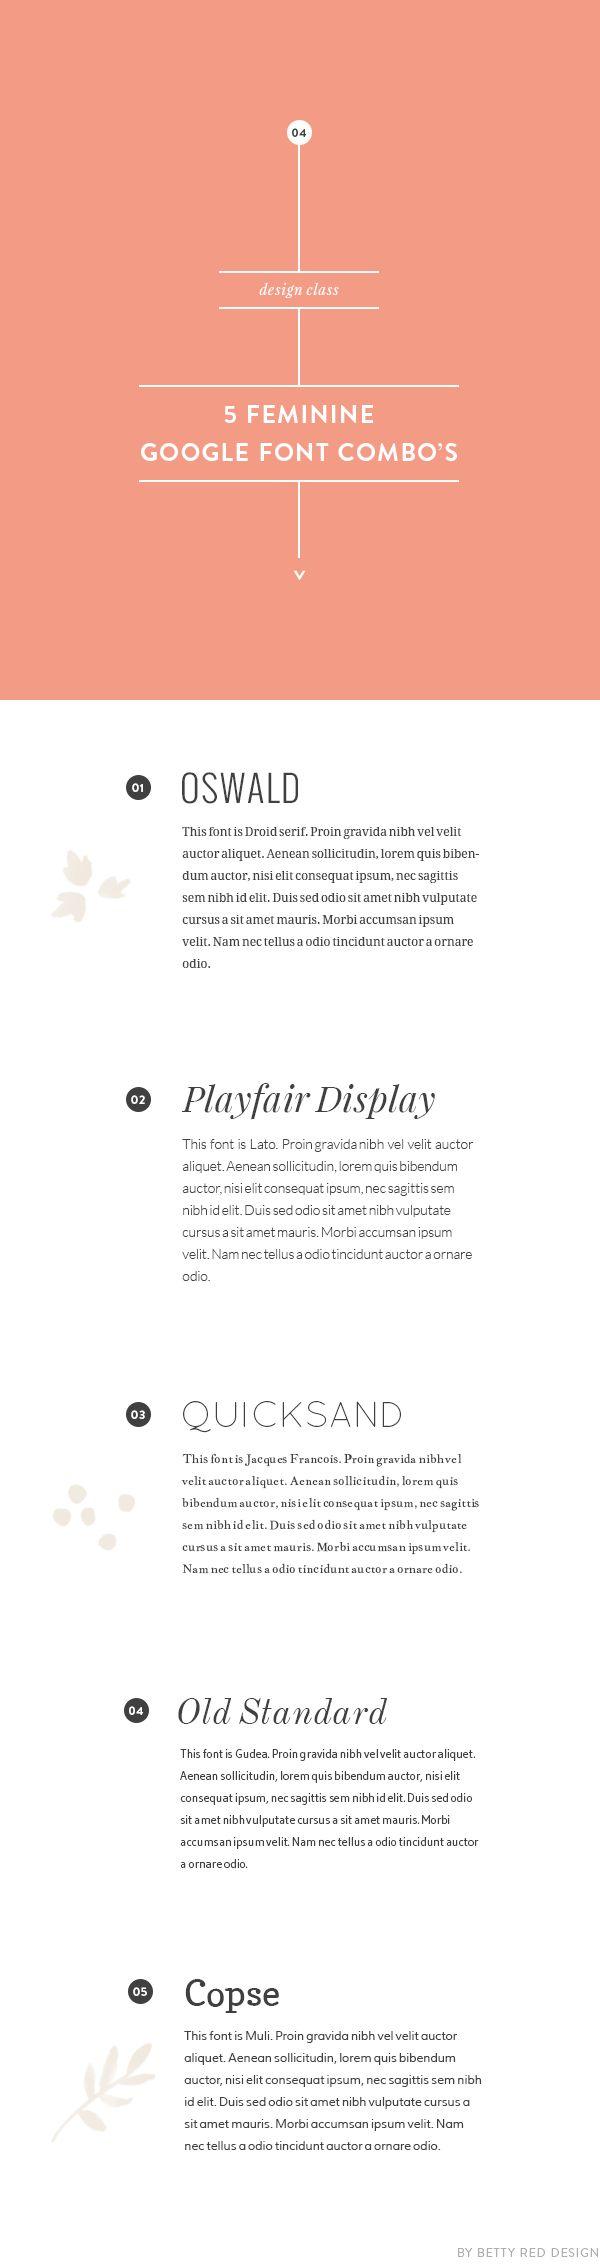 5 feminine google font combinations by neshadesigns.com